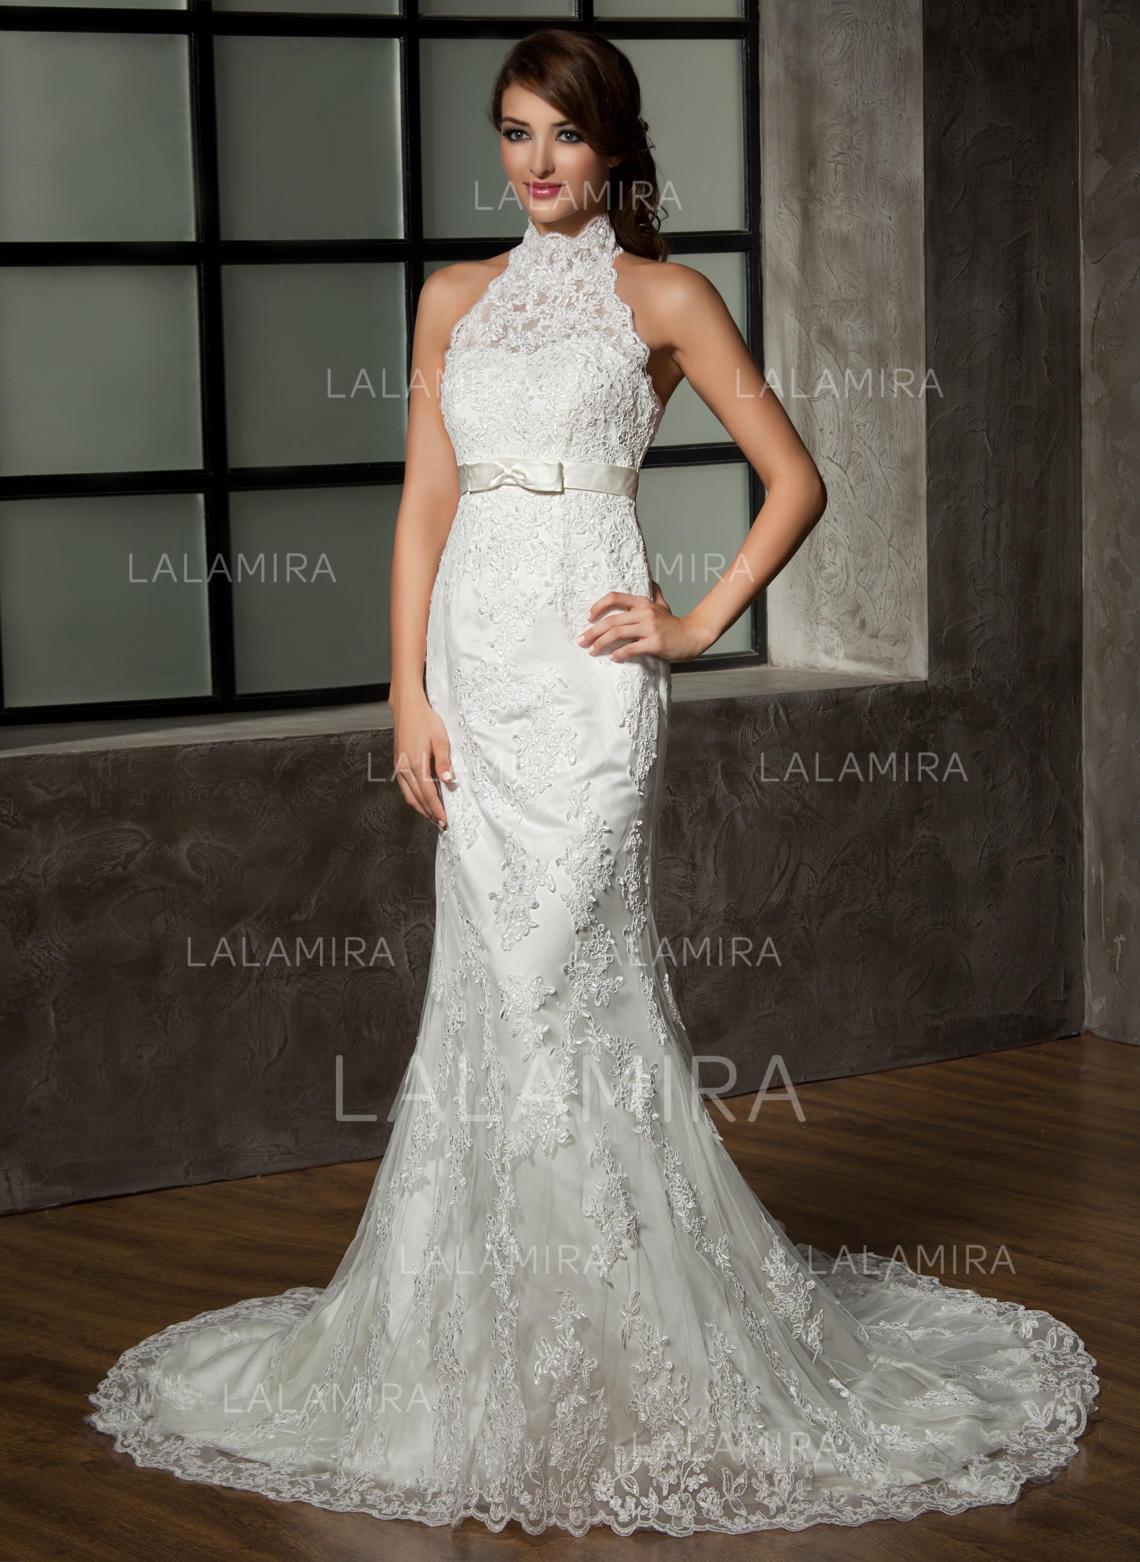 686ee79804276 Stunning Halter Trumpet Mermaid Wedding Dresses Chapel Train Tulle Lace  Sleeveless (002210410). Loading zoom